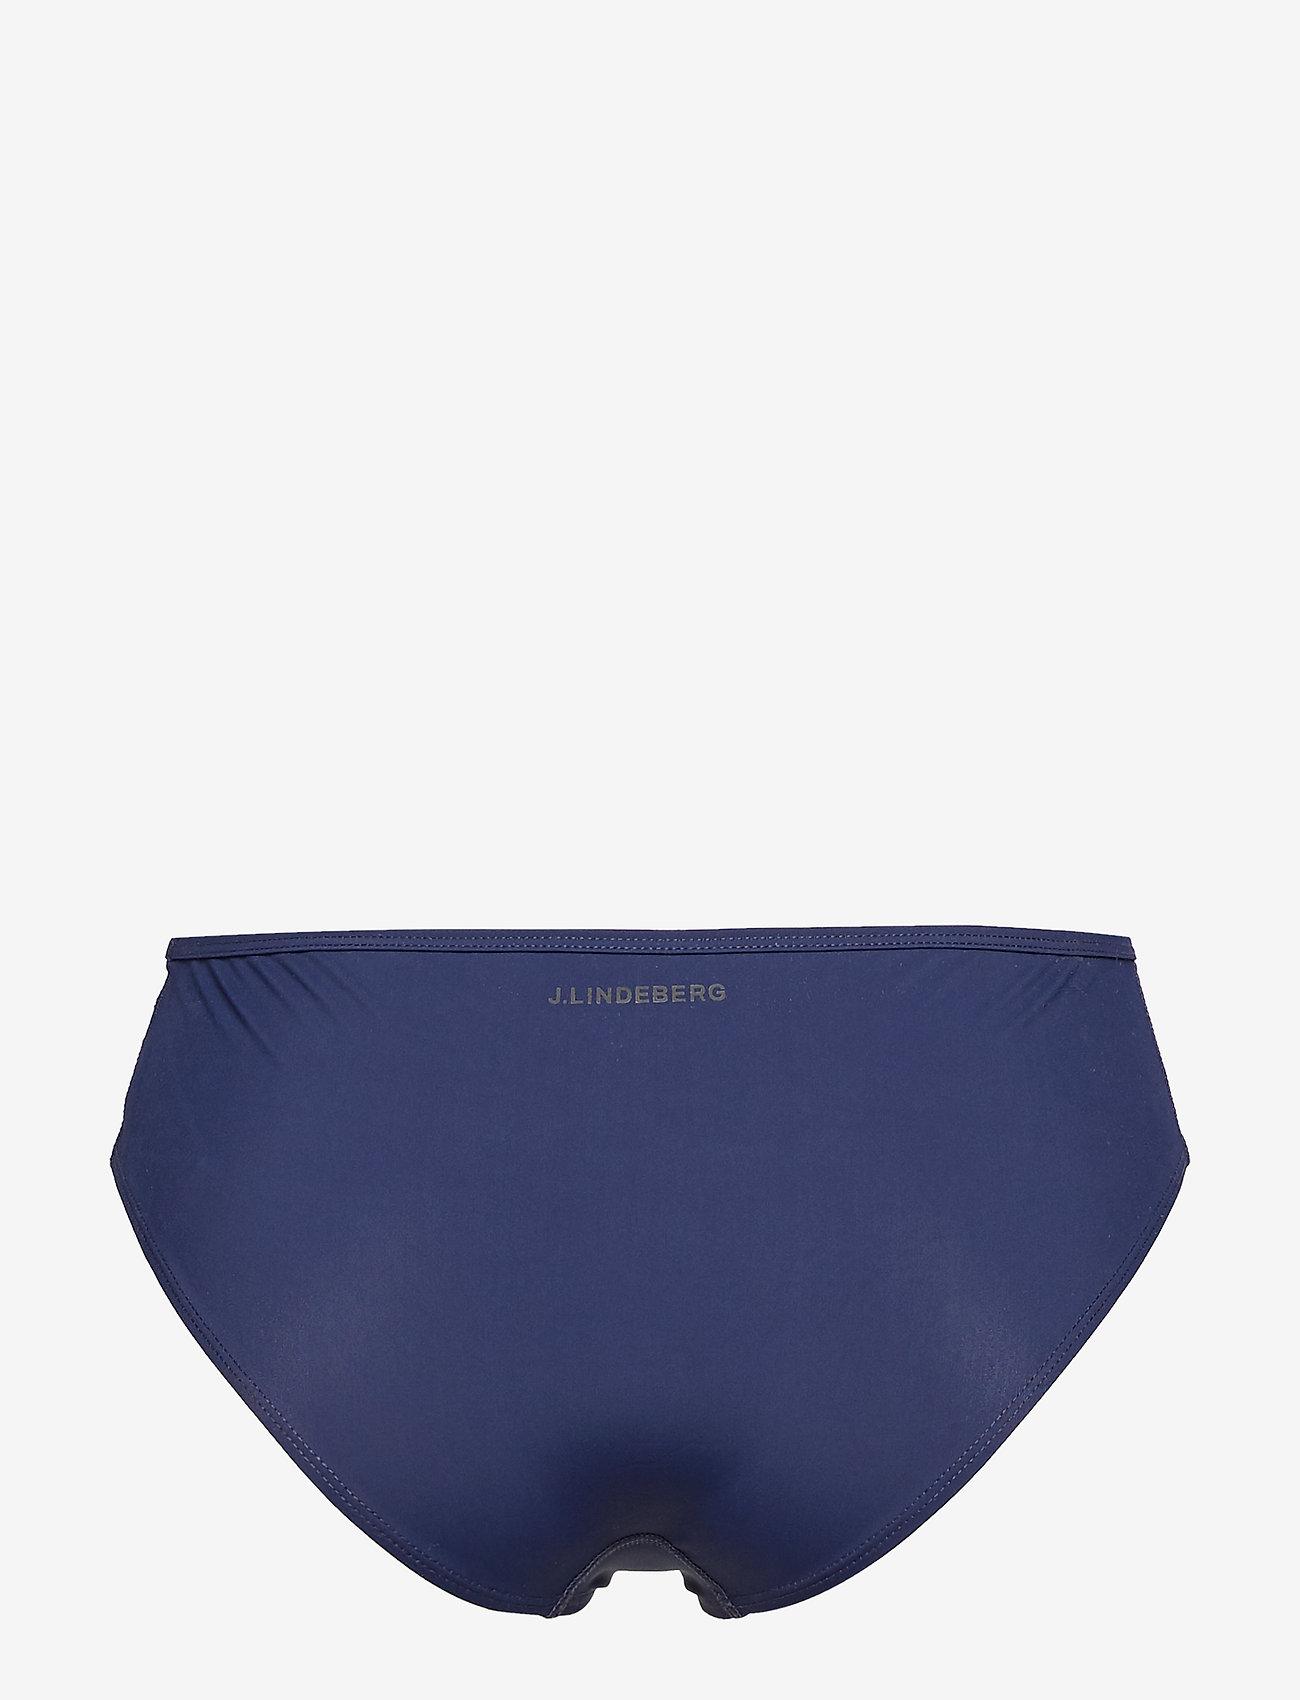 J. Lindeberg - Bethany Compression Poly - bikini underdele - jl navy - 1